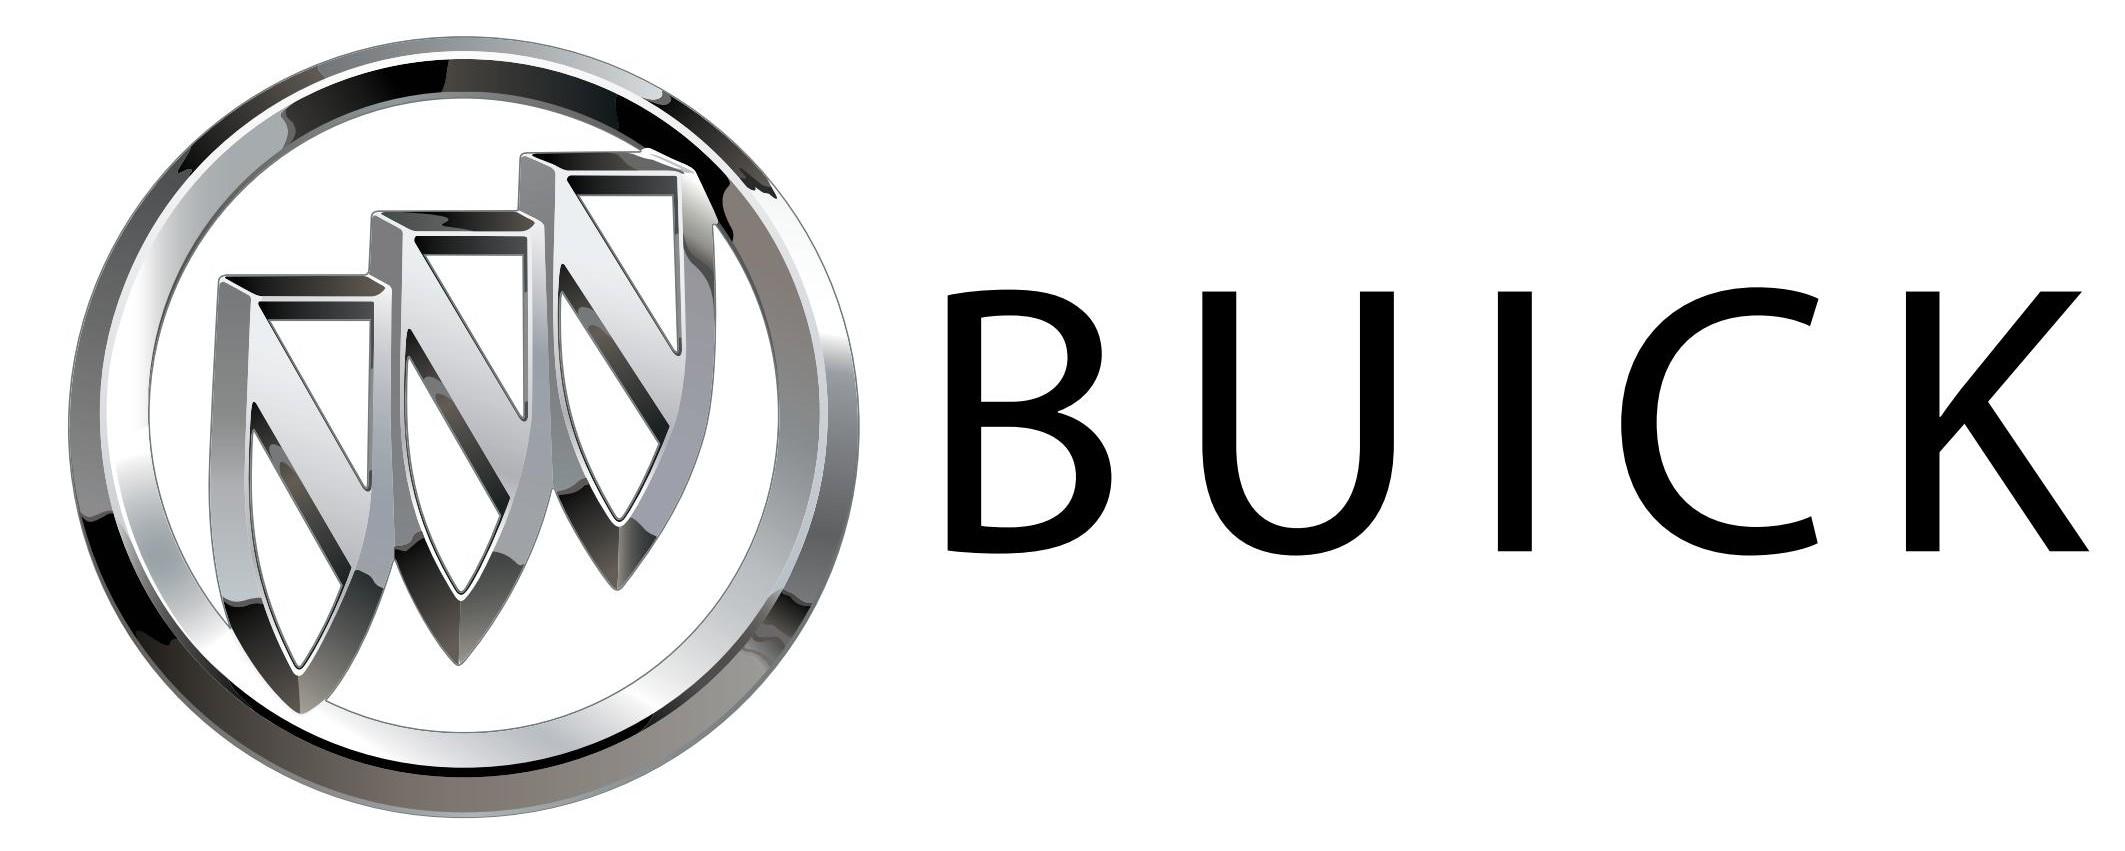 2125x851 Buick Black Logo Png Transparent Buick Black Logo.png Images